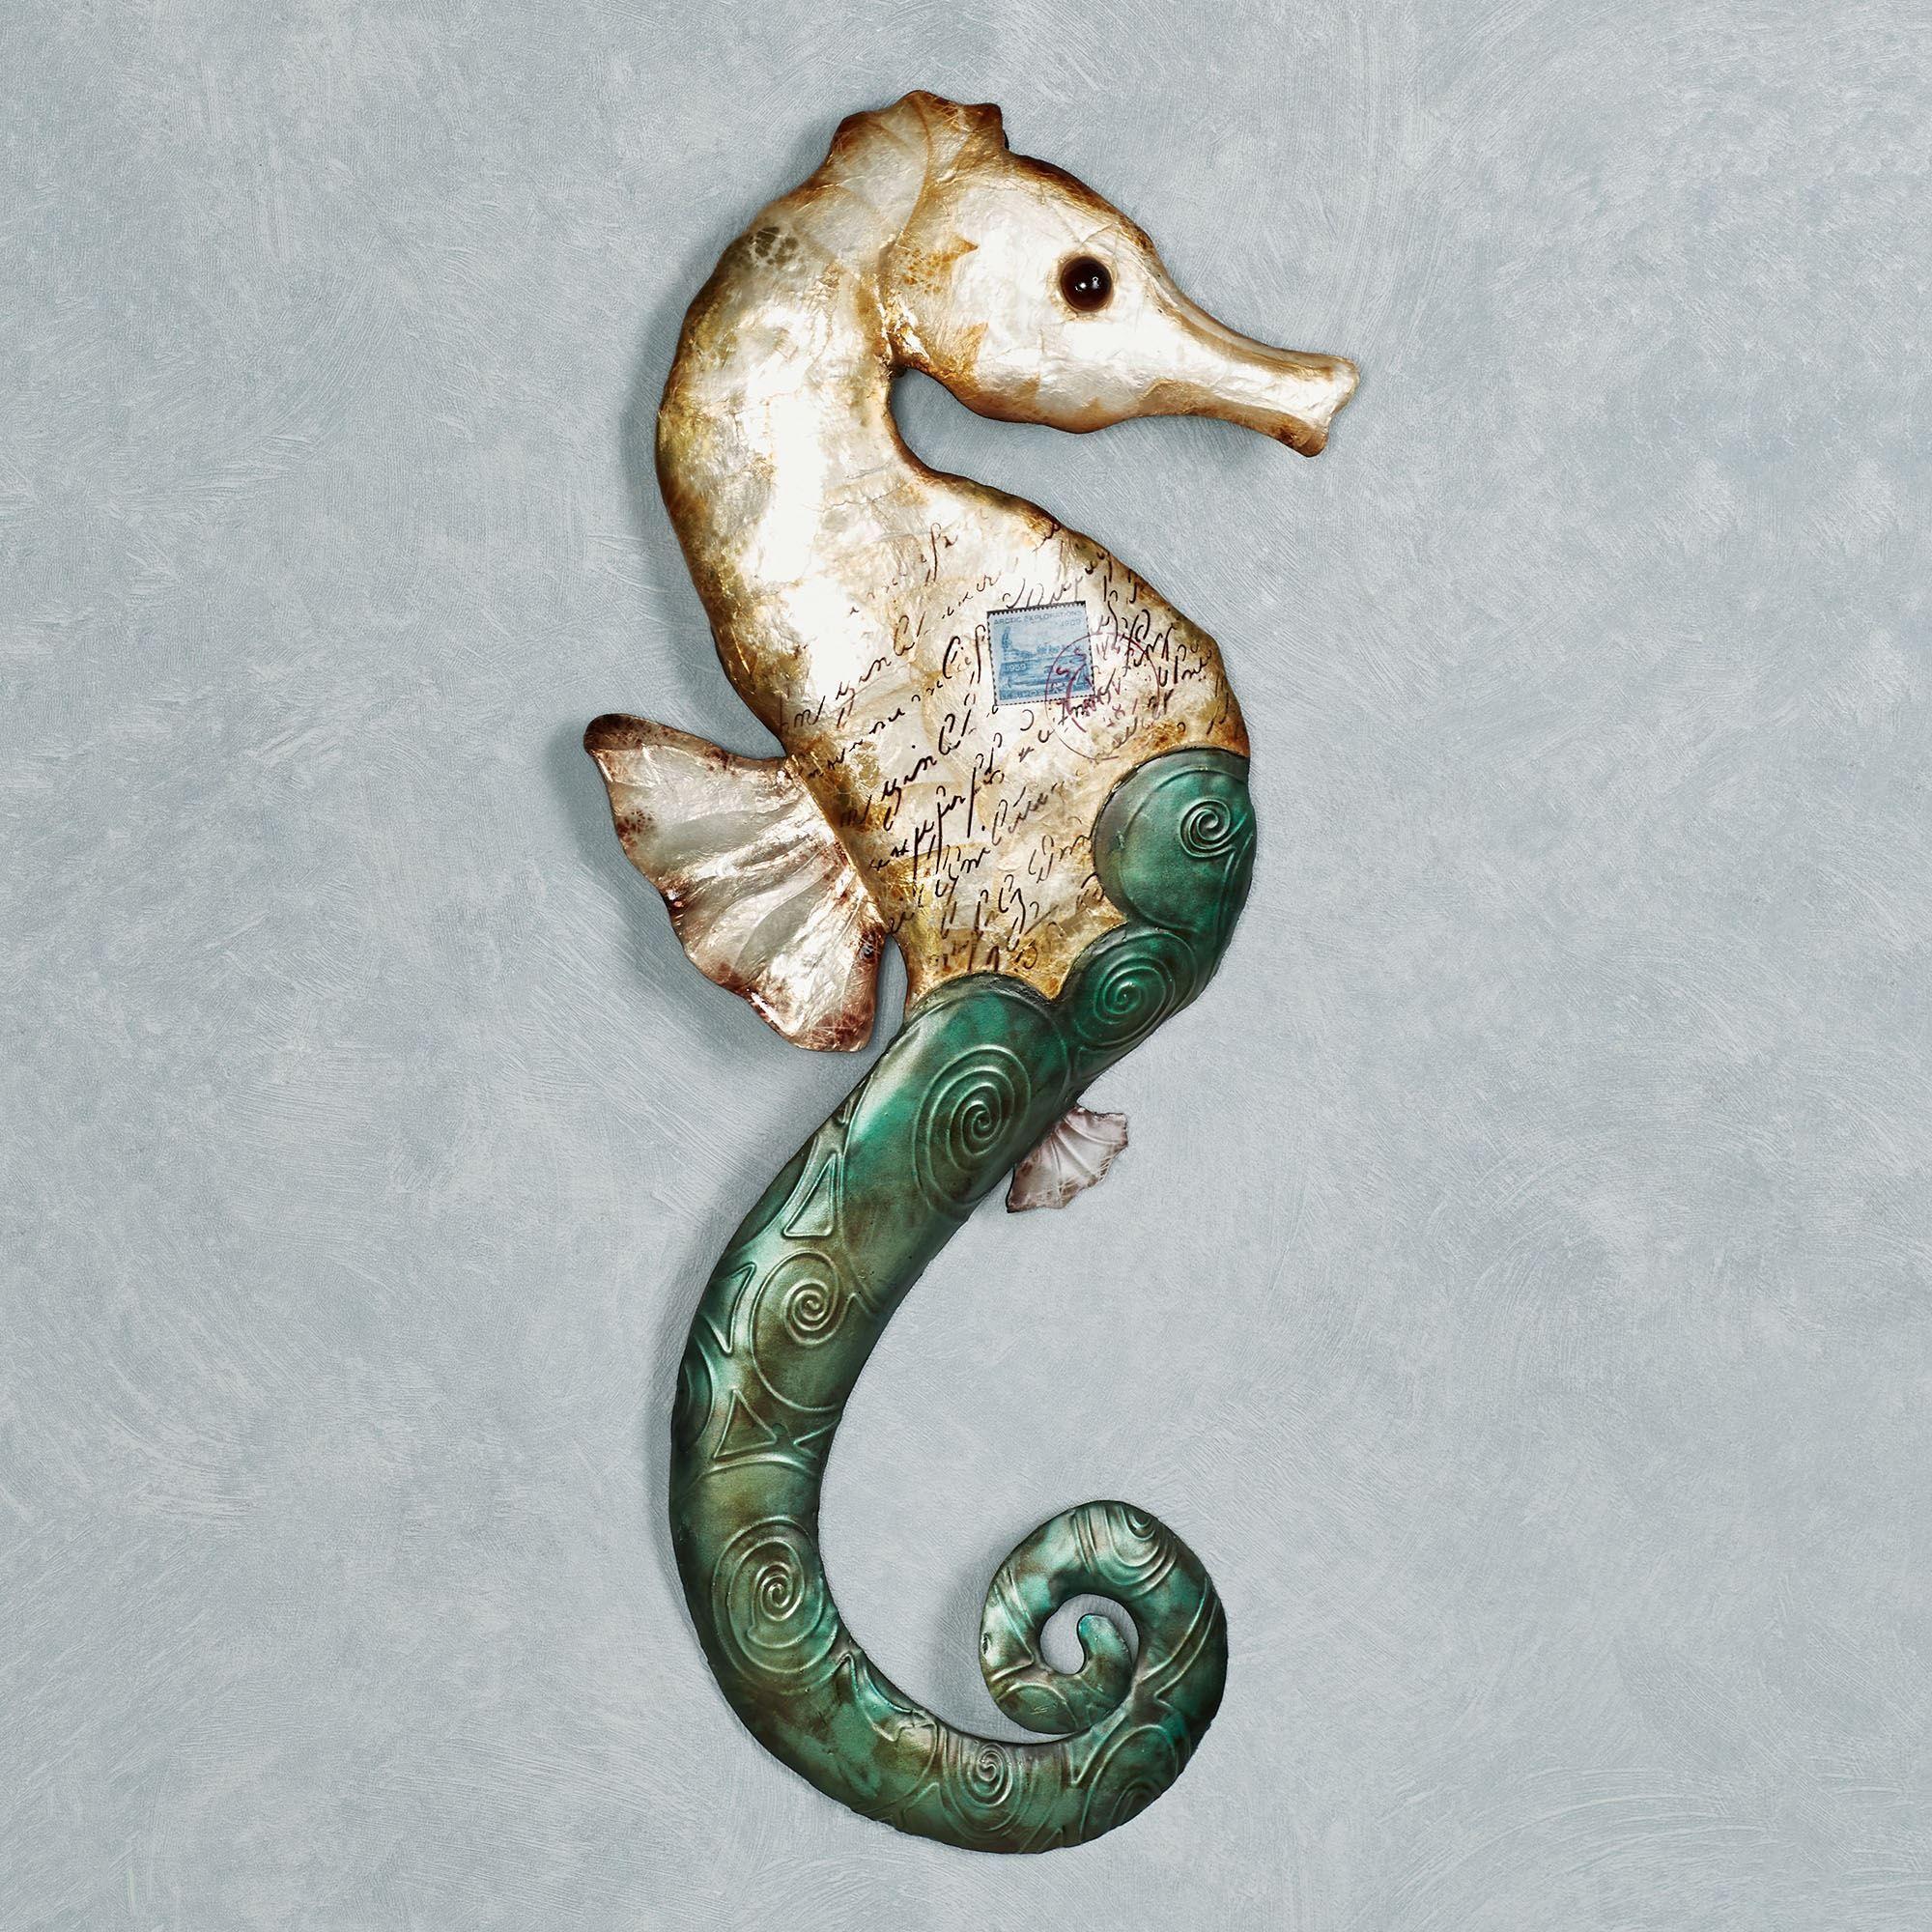 Postcard Beach Capiz Shell And Metal Seahorse Wall Art Seahorse Wall Art Wall Art Seahorse